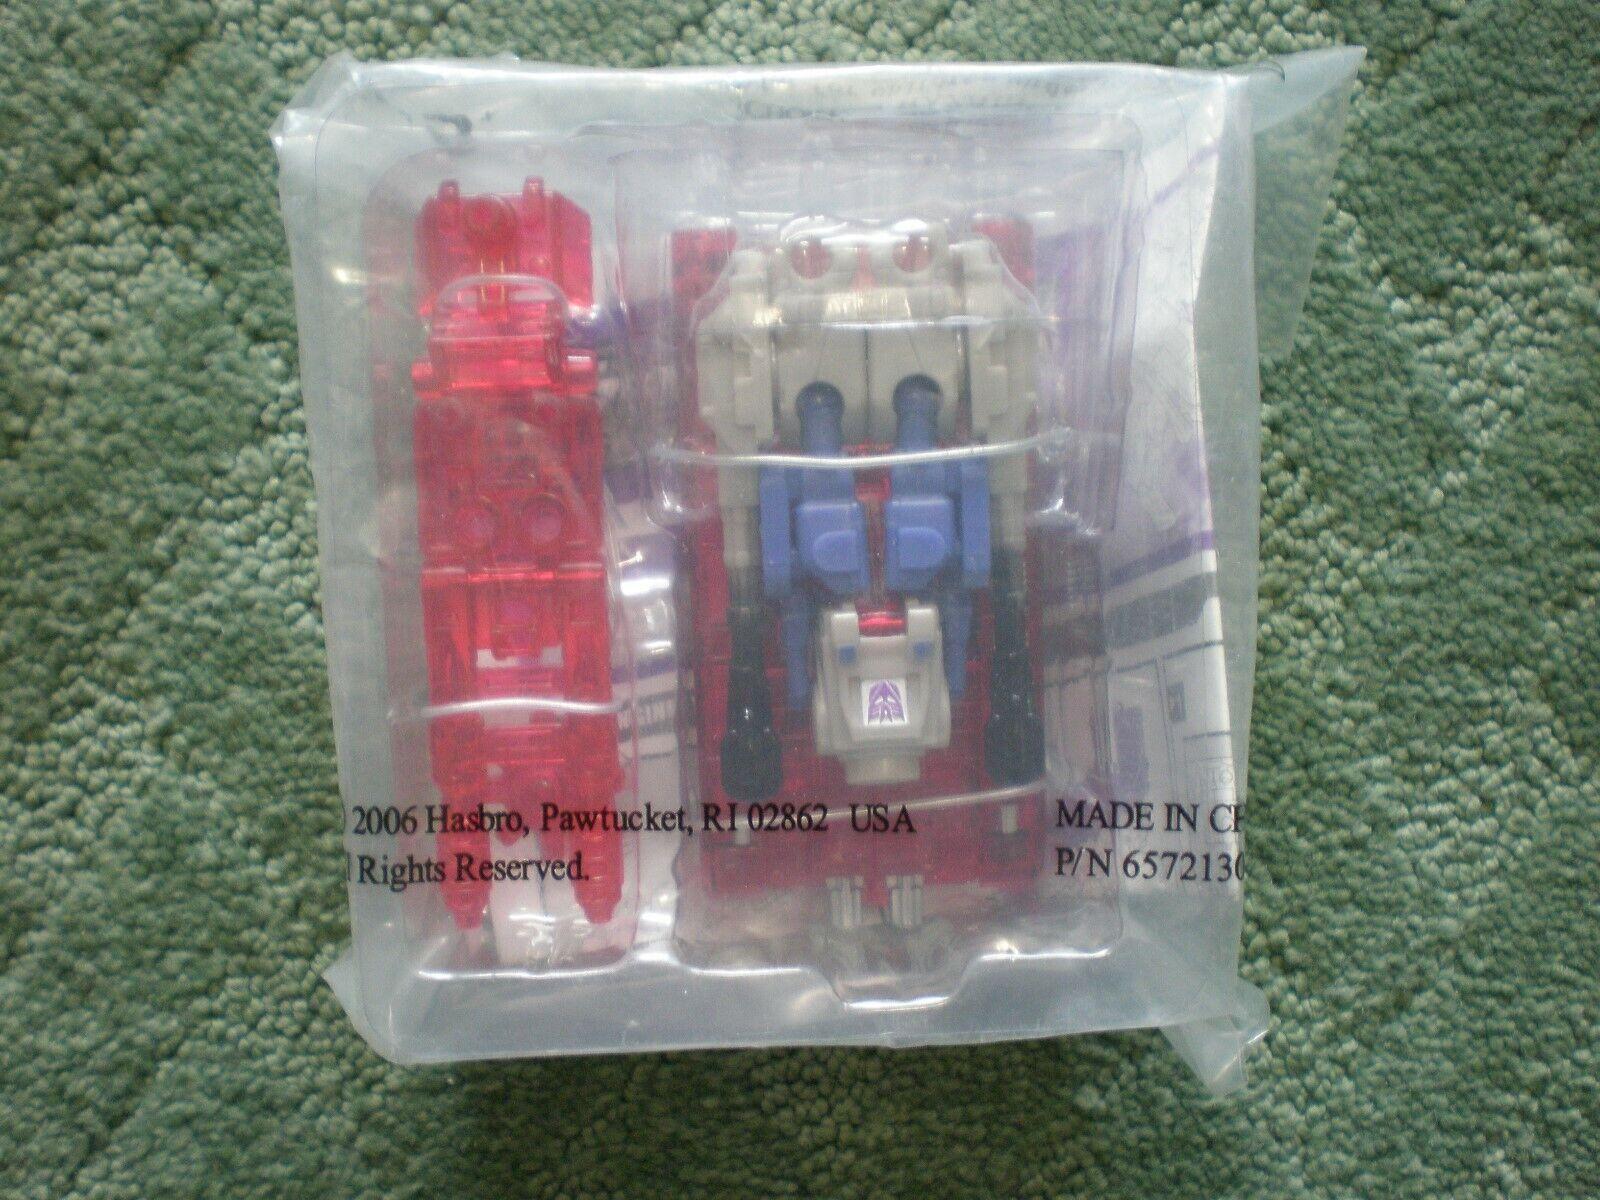 Transformers Collector's Club - 2006 LANDQUAKE w Collector's Bio. Card - MISP